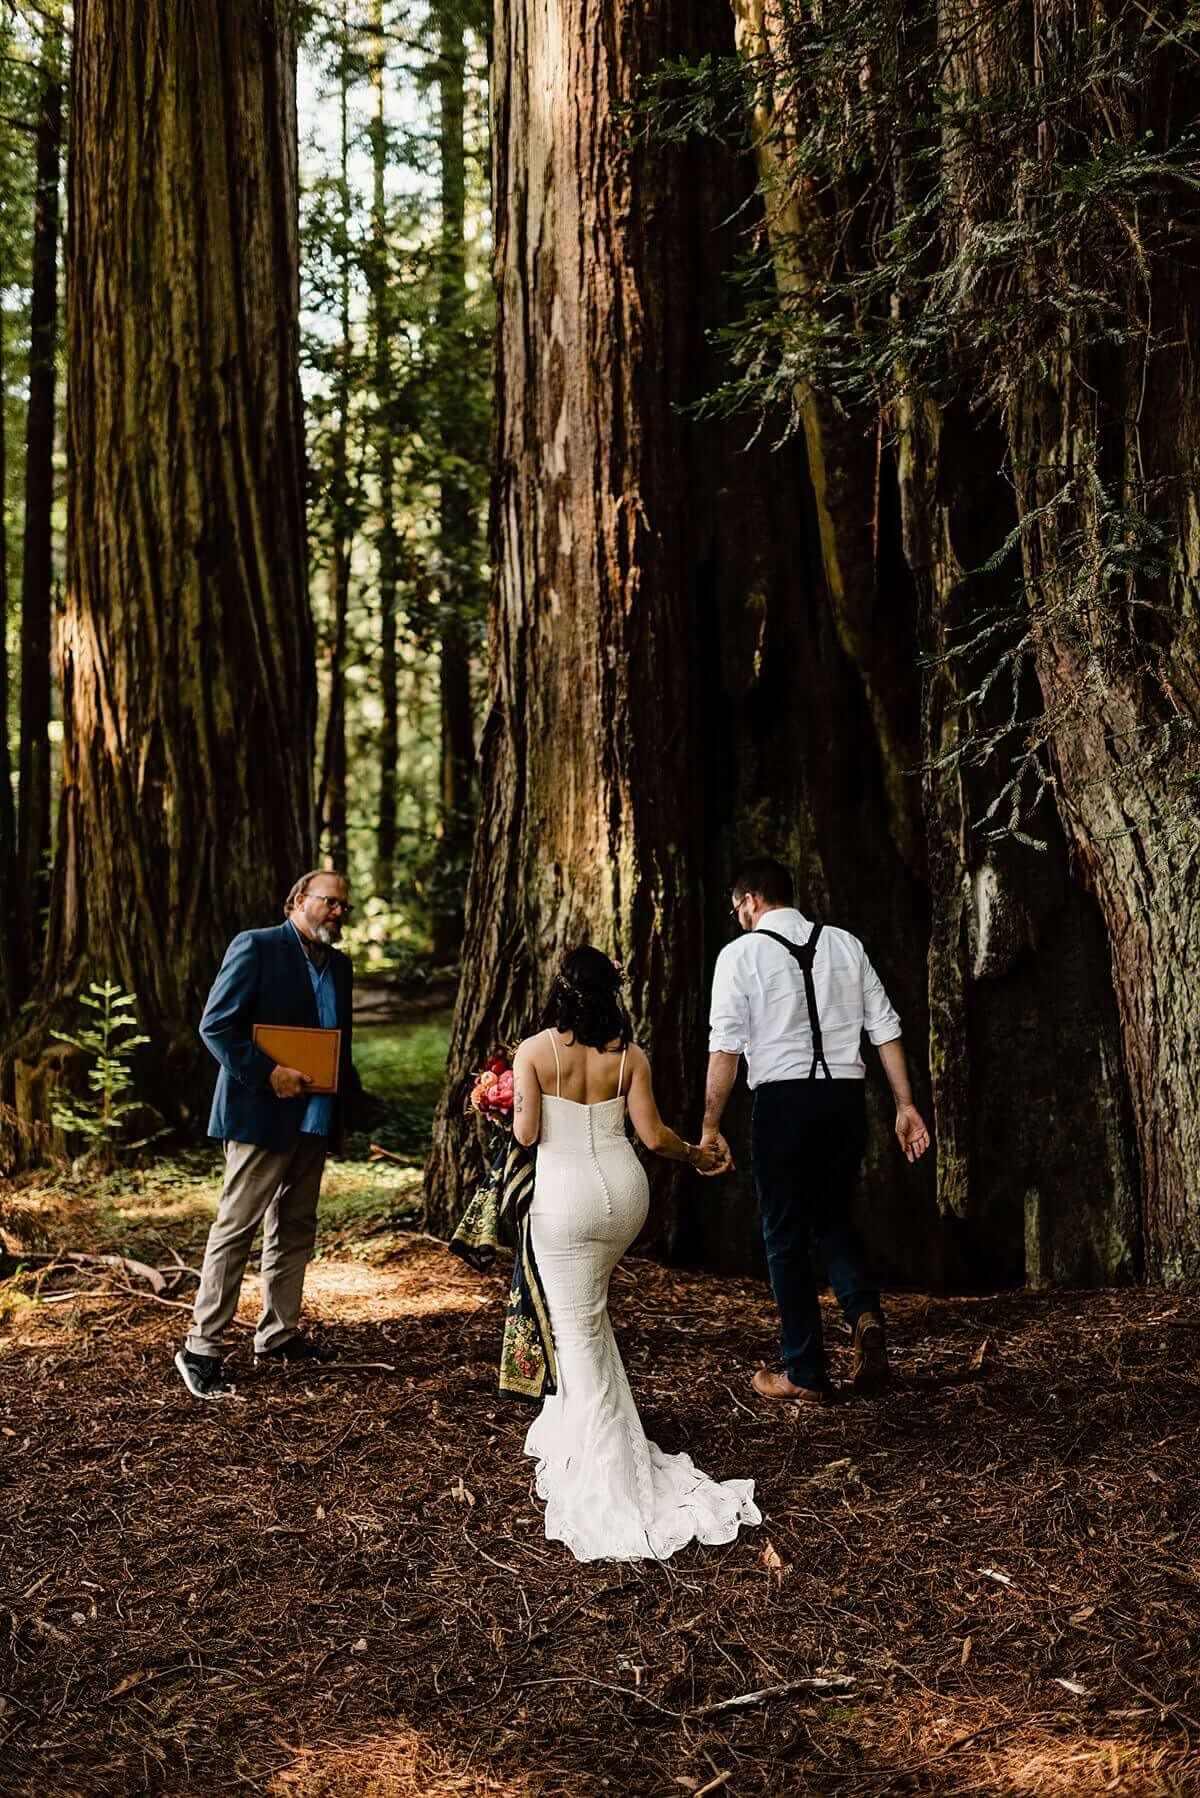 Allison-Brooks-Jedediah-Smiith-Redwoods-Adventure-Elopement-Wedding-S-Photography-Blog_0014.jpg